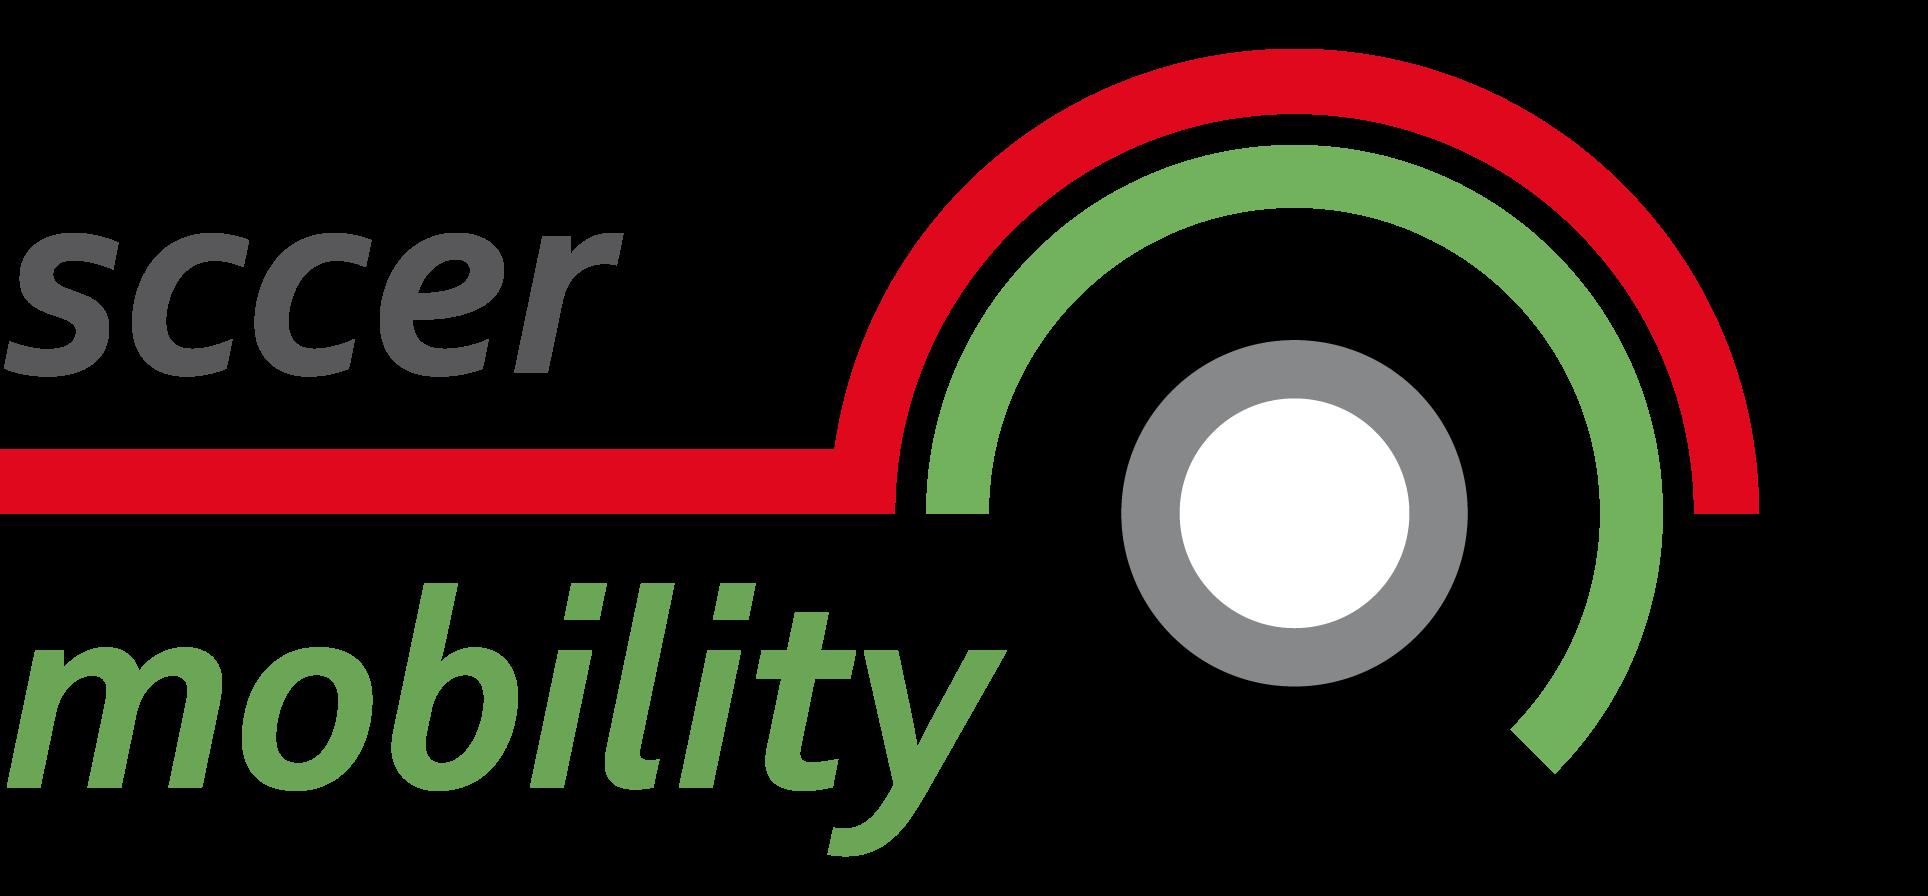 SCCER Mobility